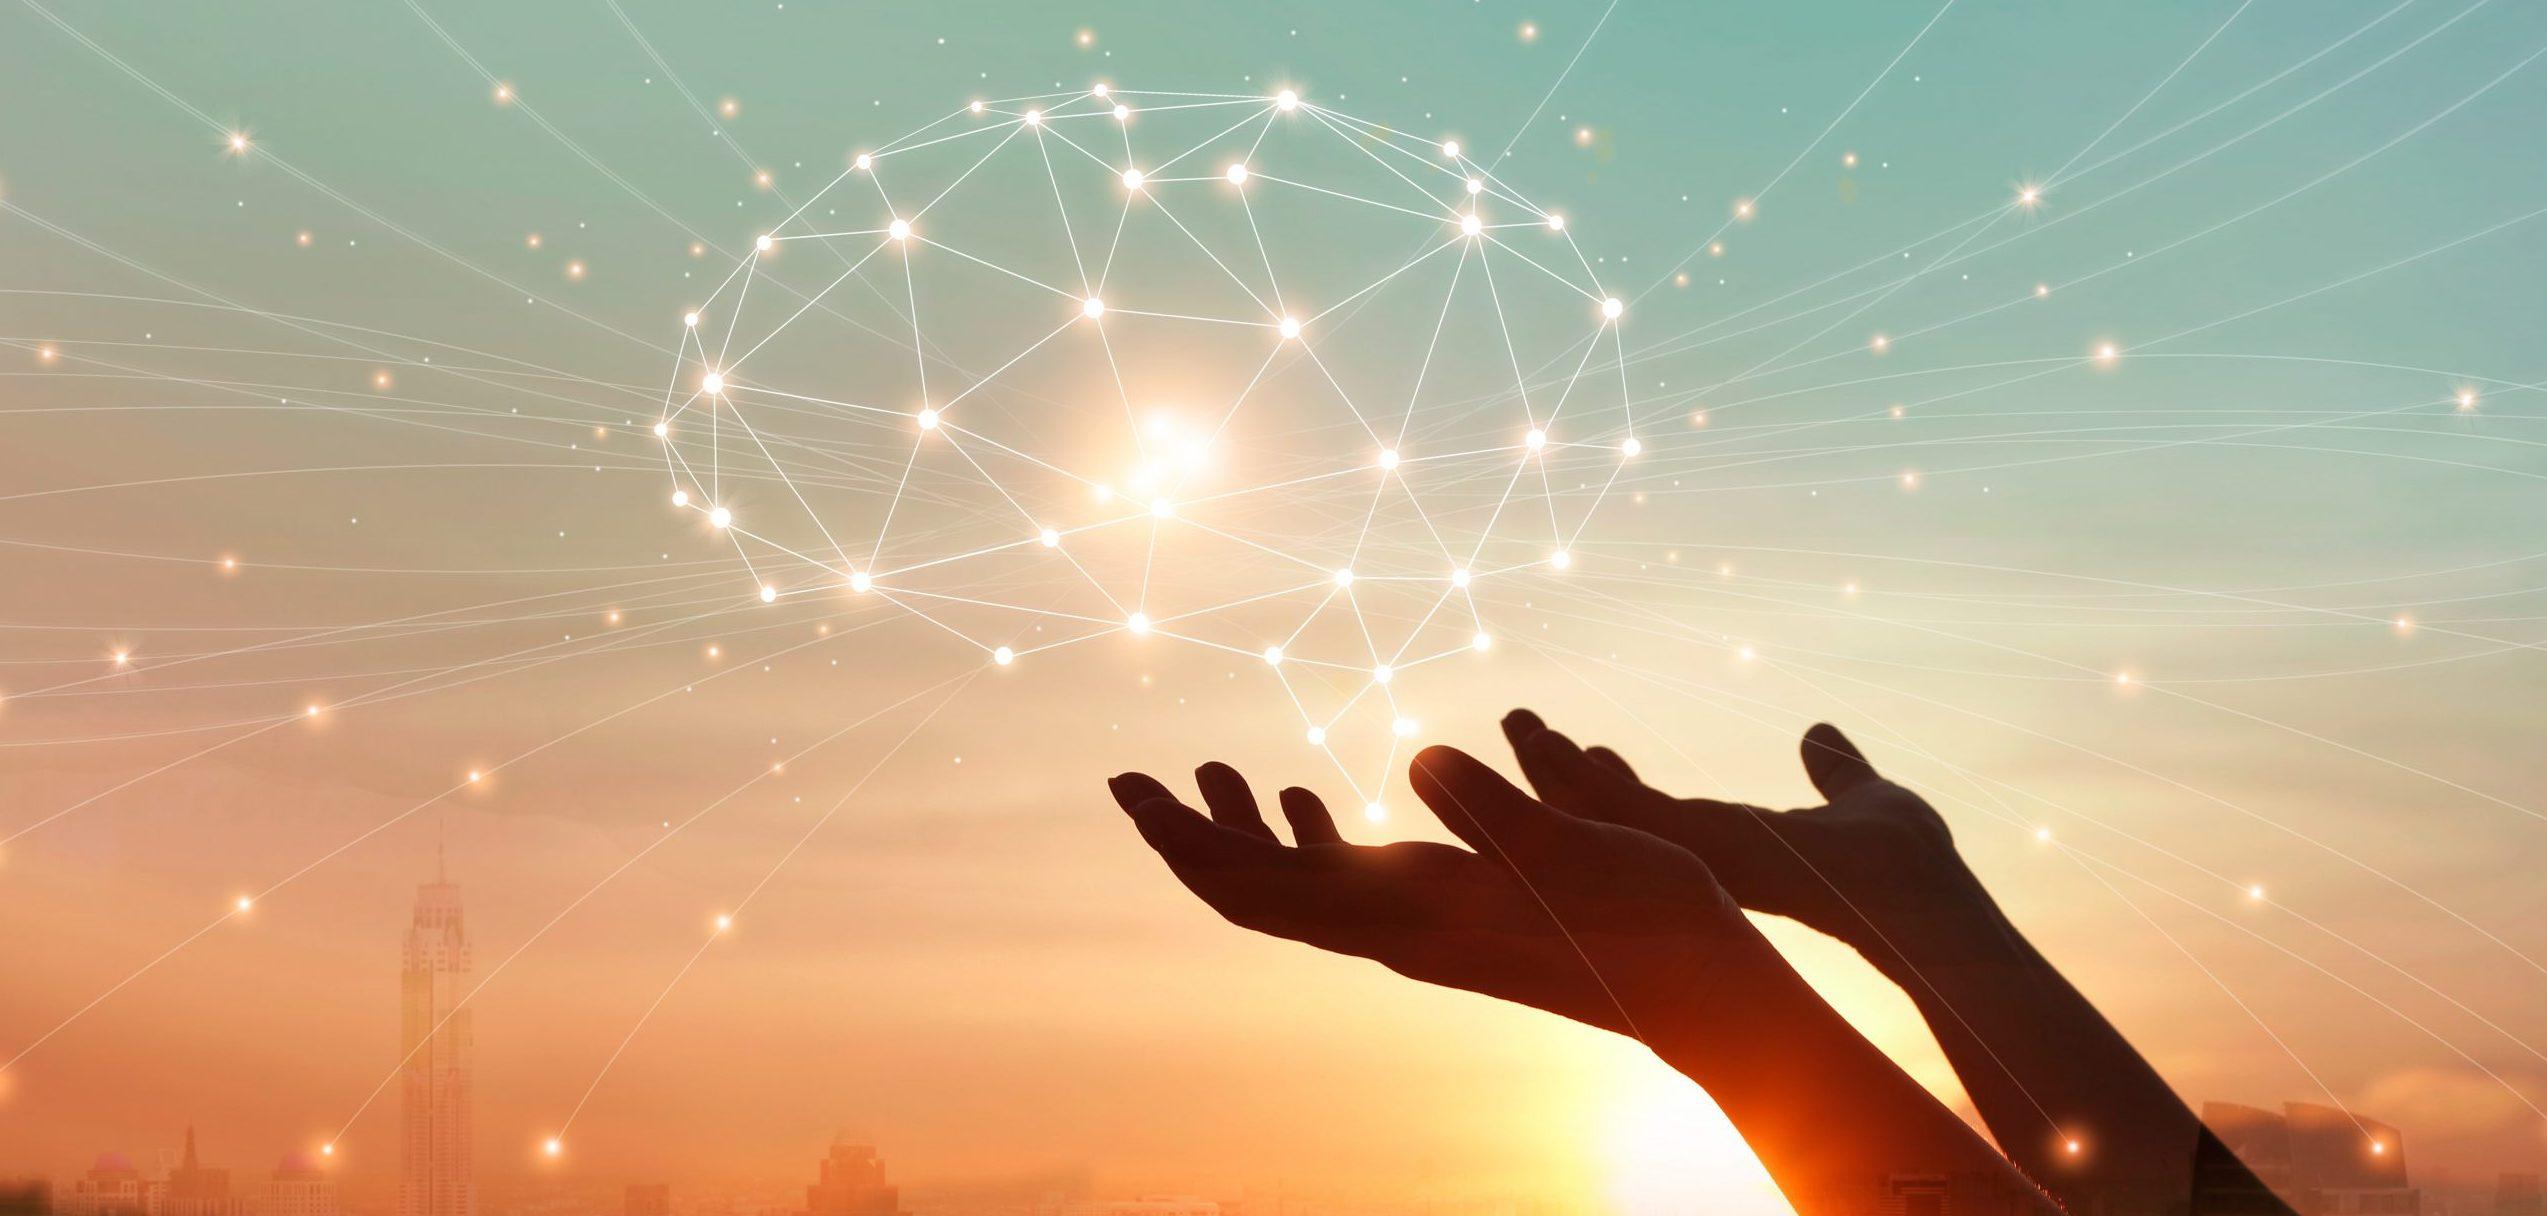 Understanding behaviour is key to effective transformation